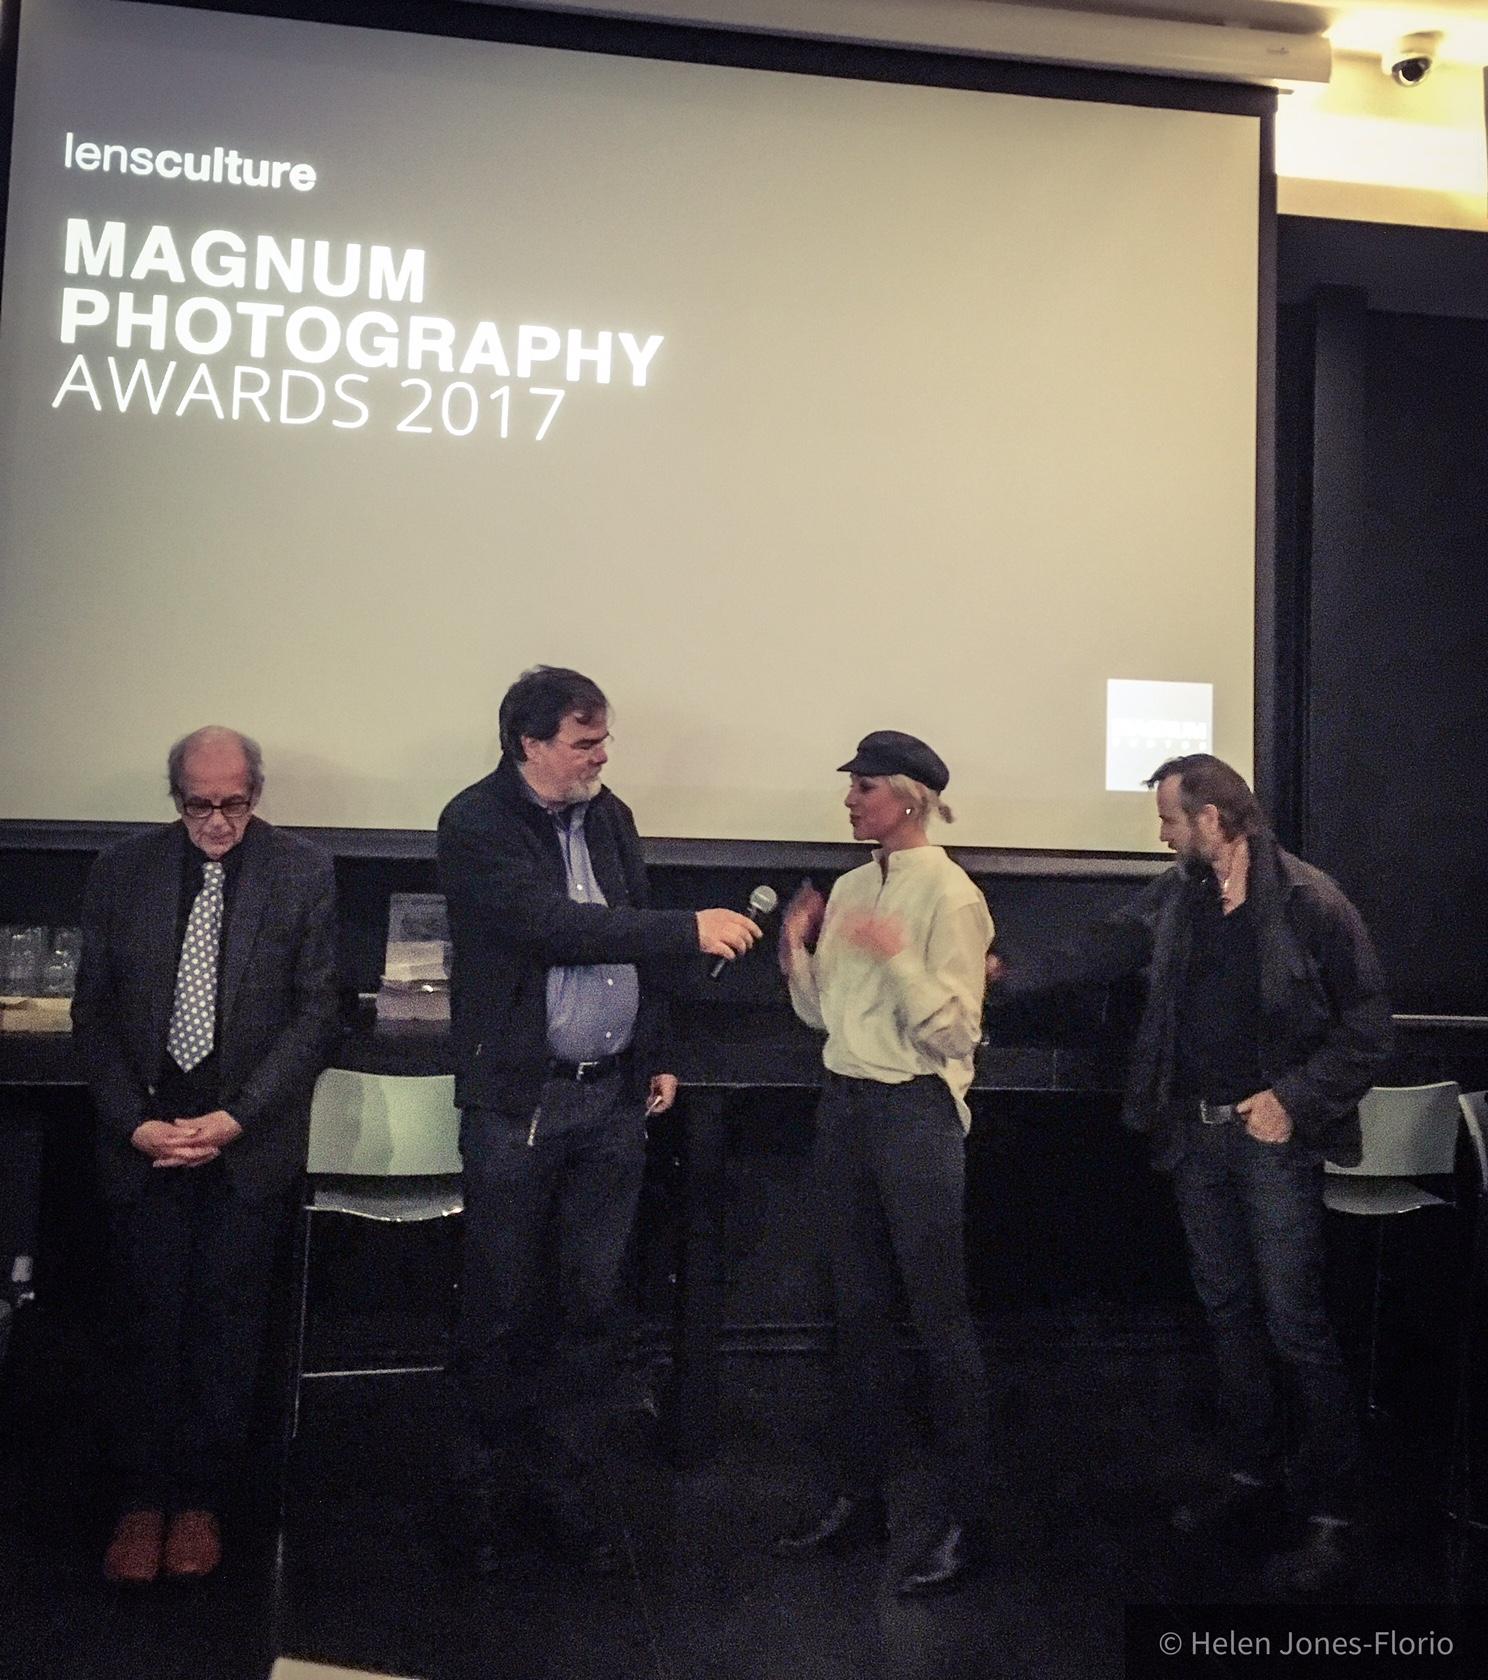 Magnum Photography Awards Winner 2017 - Ramona Decker talks to Jim Casper, LensCulture, The Photographers Gallery, London